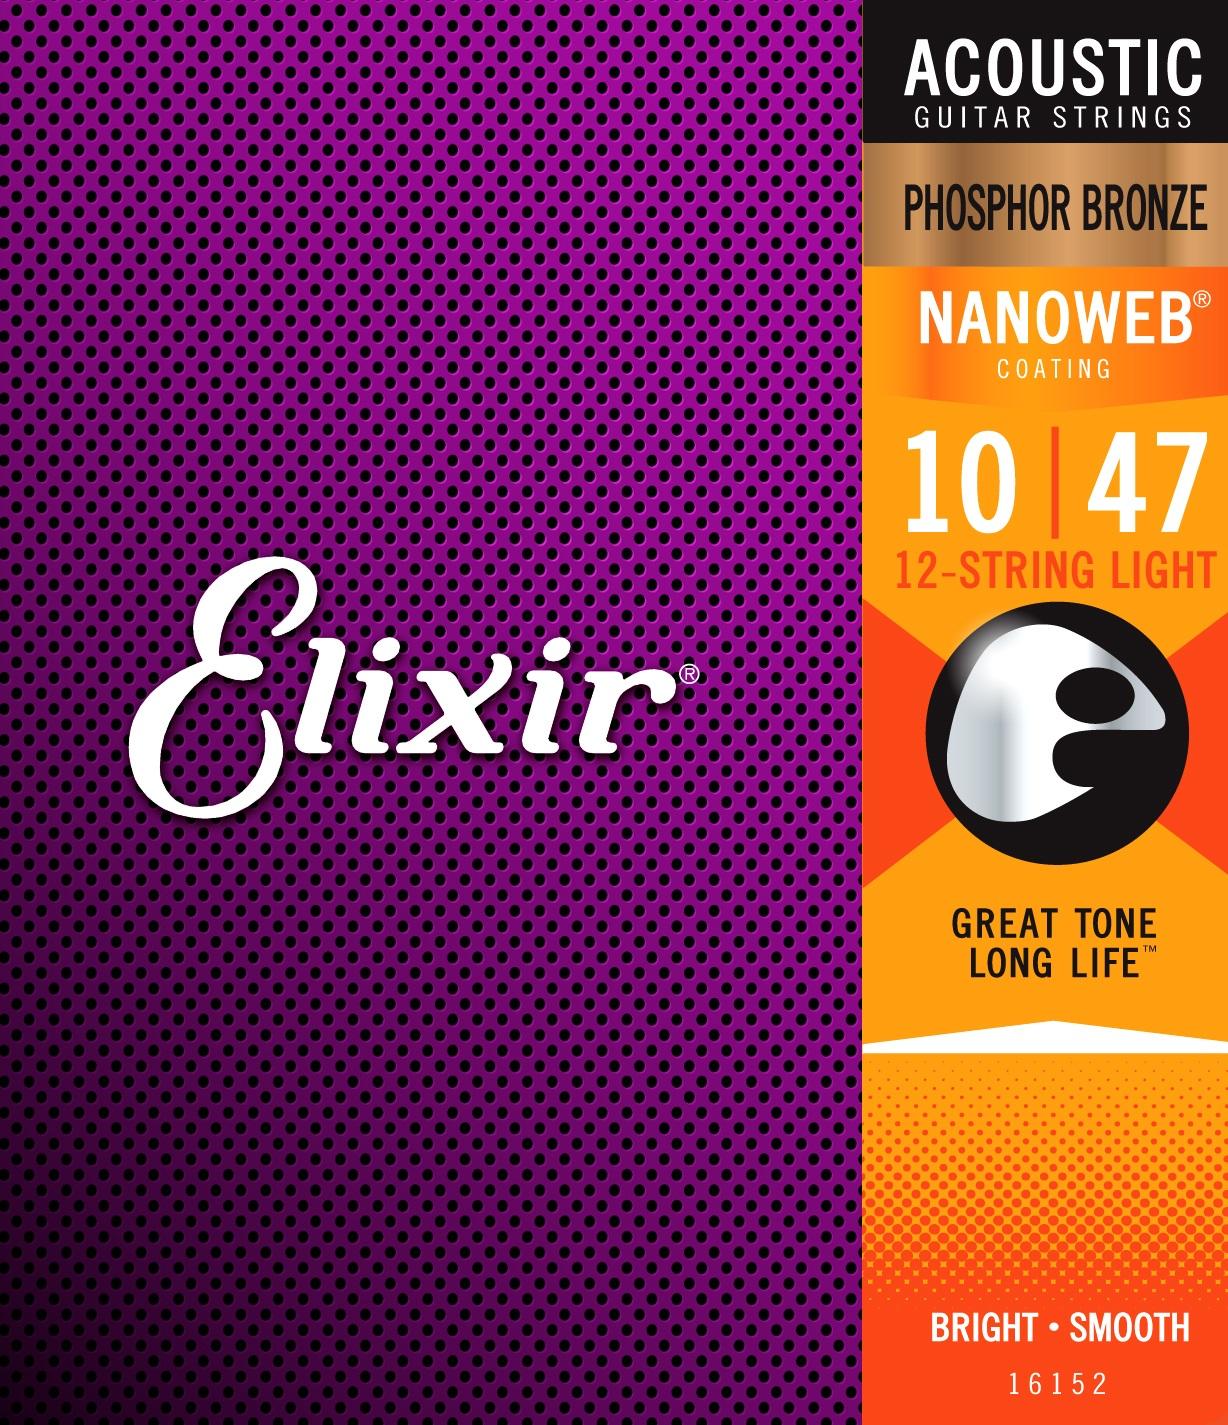 Elixir Nanoweb Phosphor Bronze 12-String